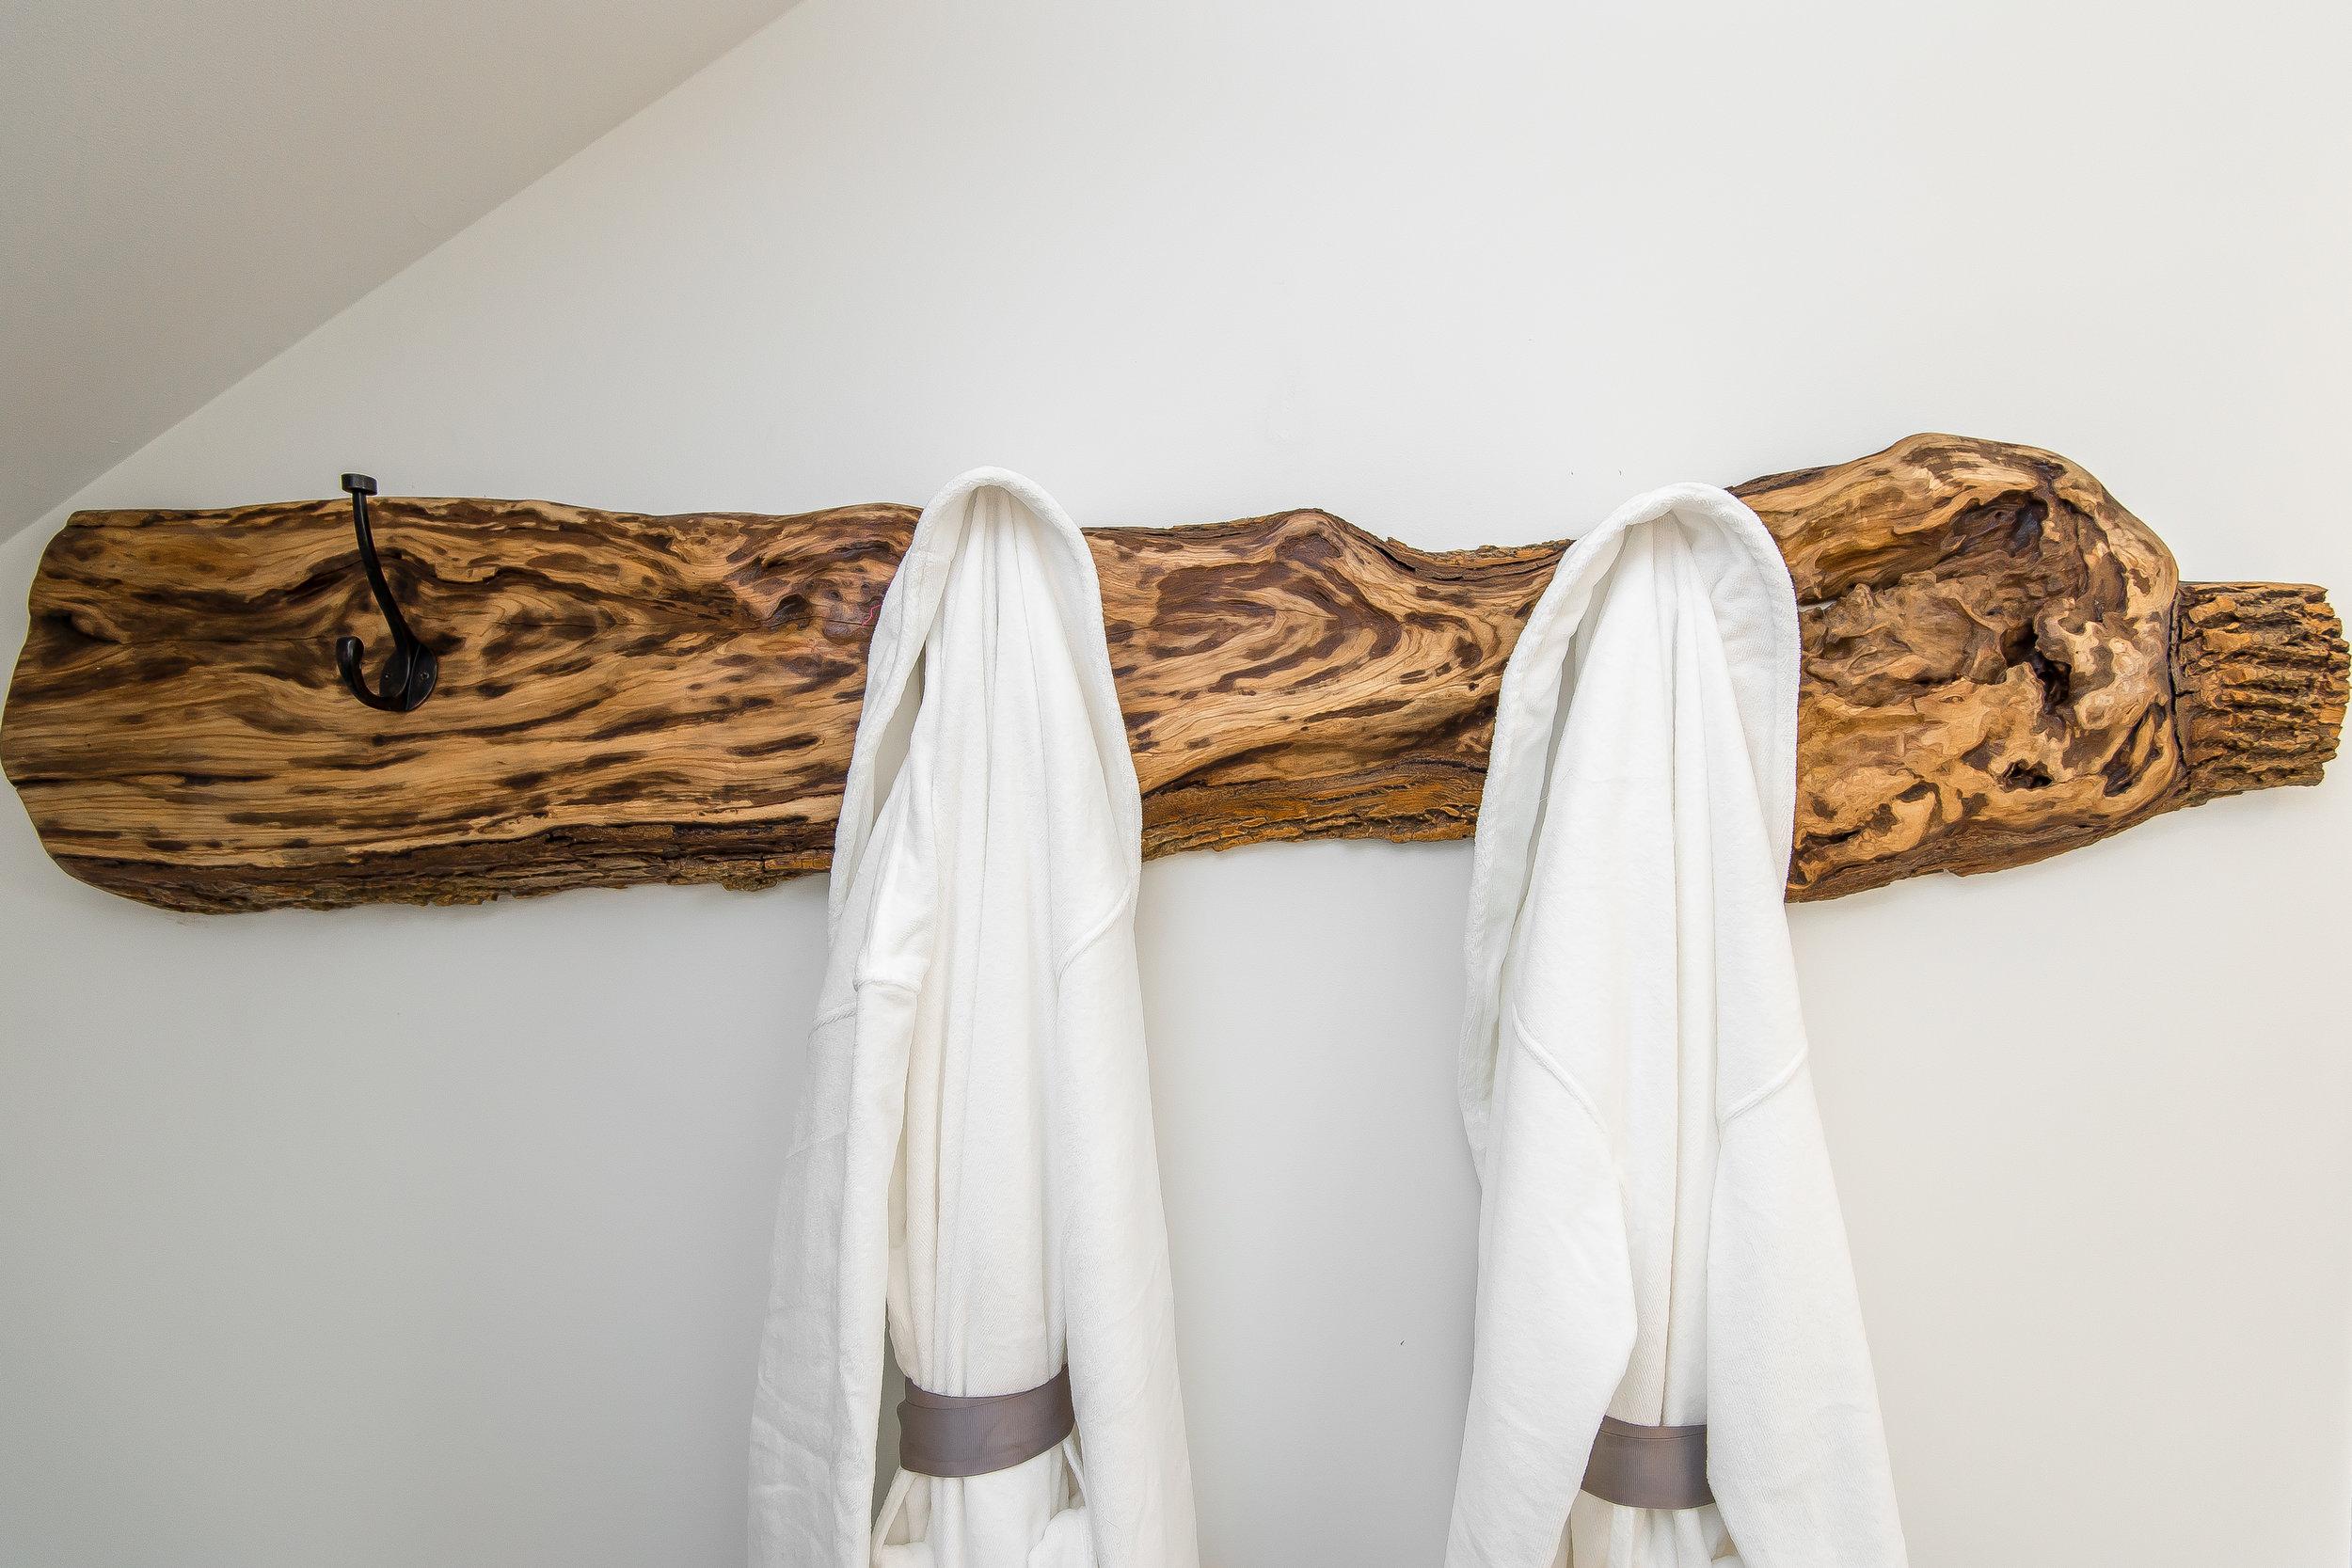 woodhangingrack_02.jpg